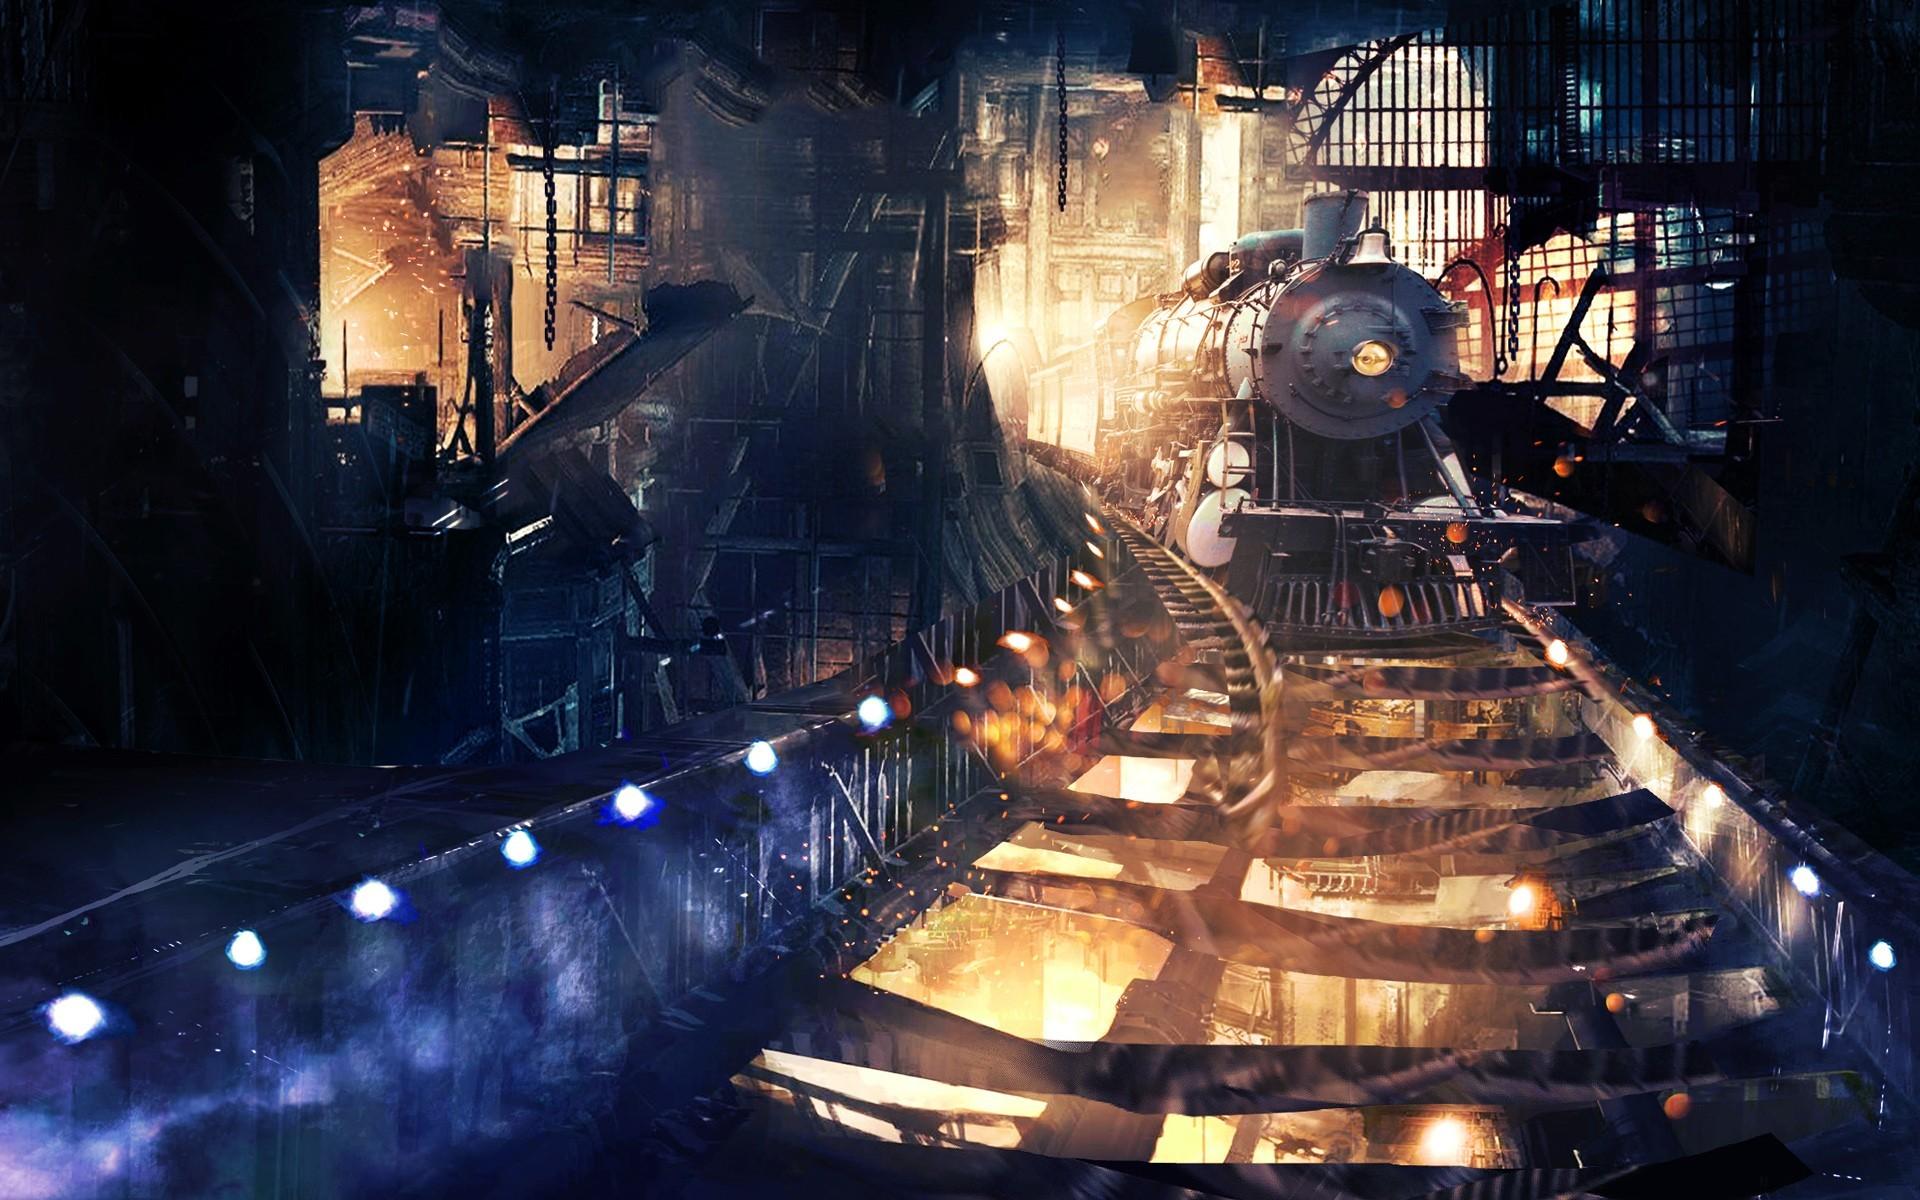 artwork, Fantasy art, Digital art, Train, Steam locomotive, Train station, Steampunk  Wallpapers HD / Desktop and Mobile Backgrounds